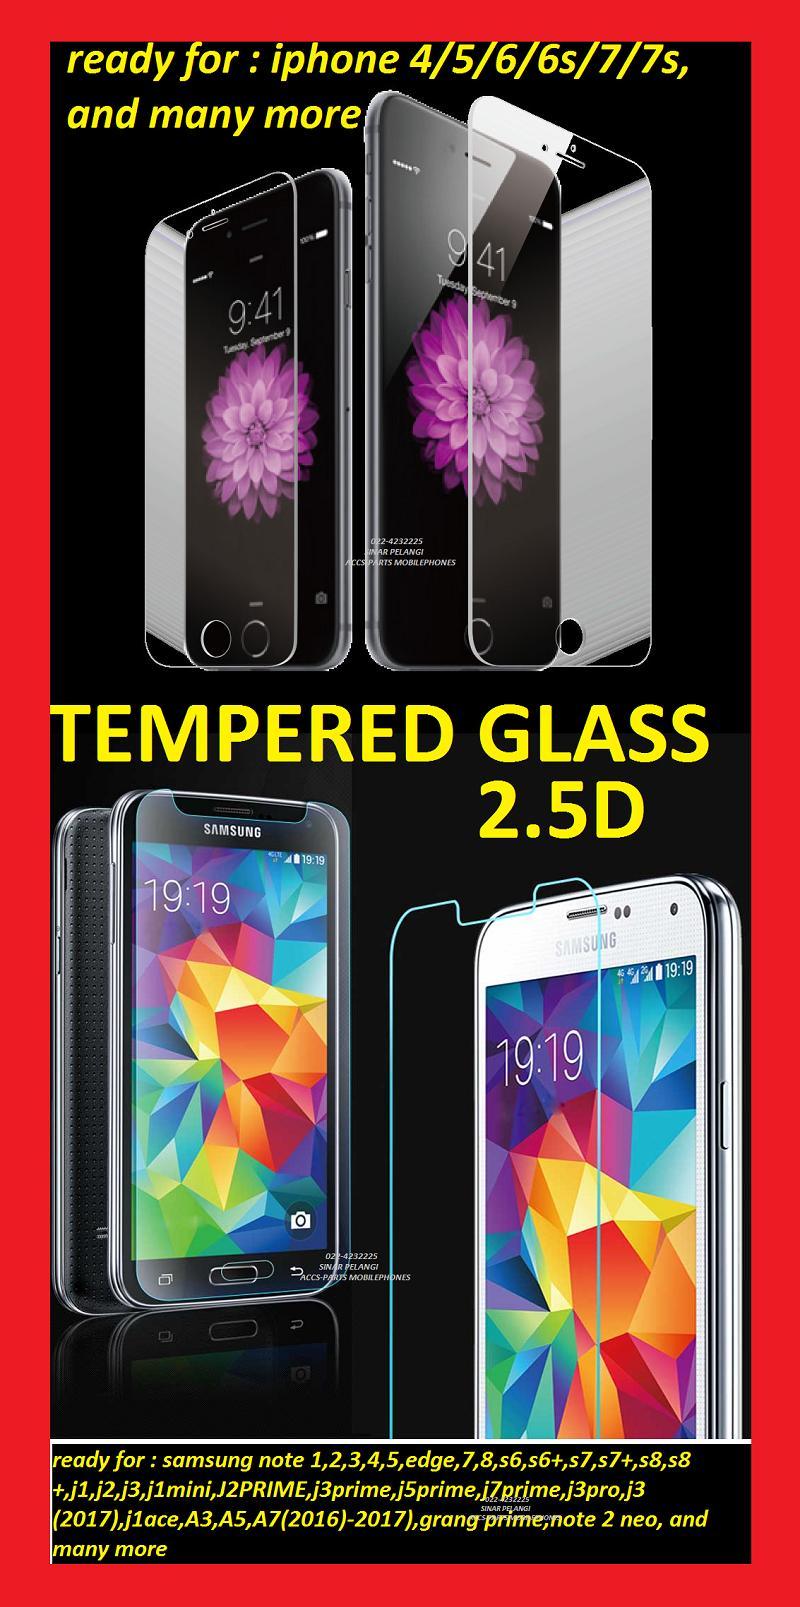 HUAWEI HONOR 3C PLAY ANTI TEMPERED GLASS GORES TEMPER KACA SCREEN GUARD PROTECTOR PELINDUNG LAYAR HIFI 904872